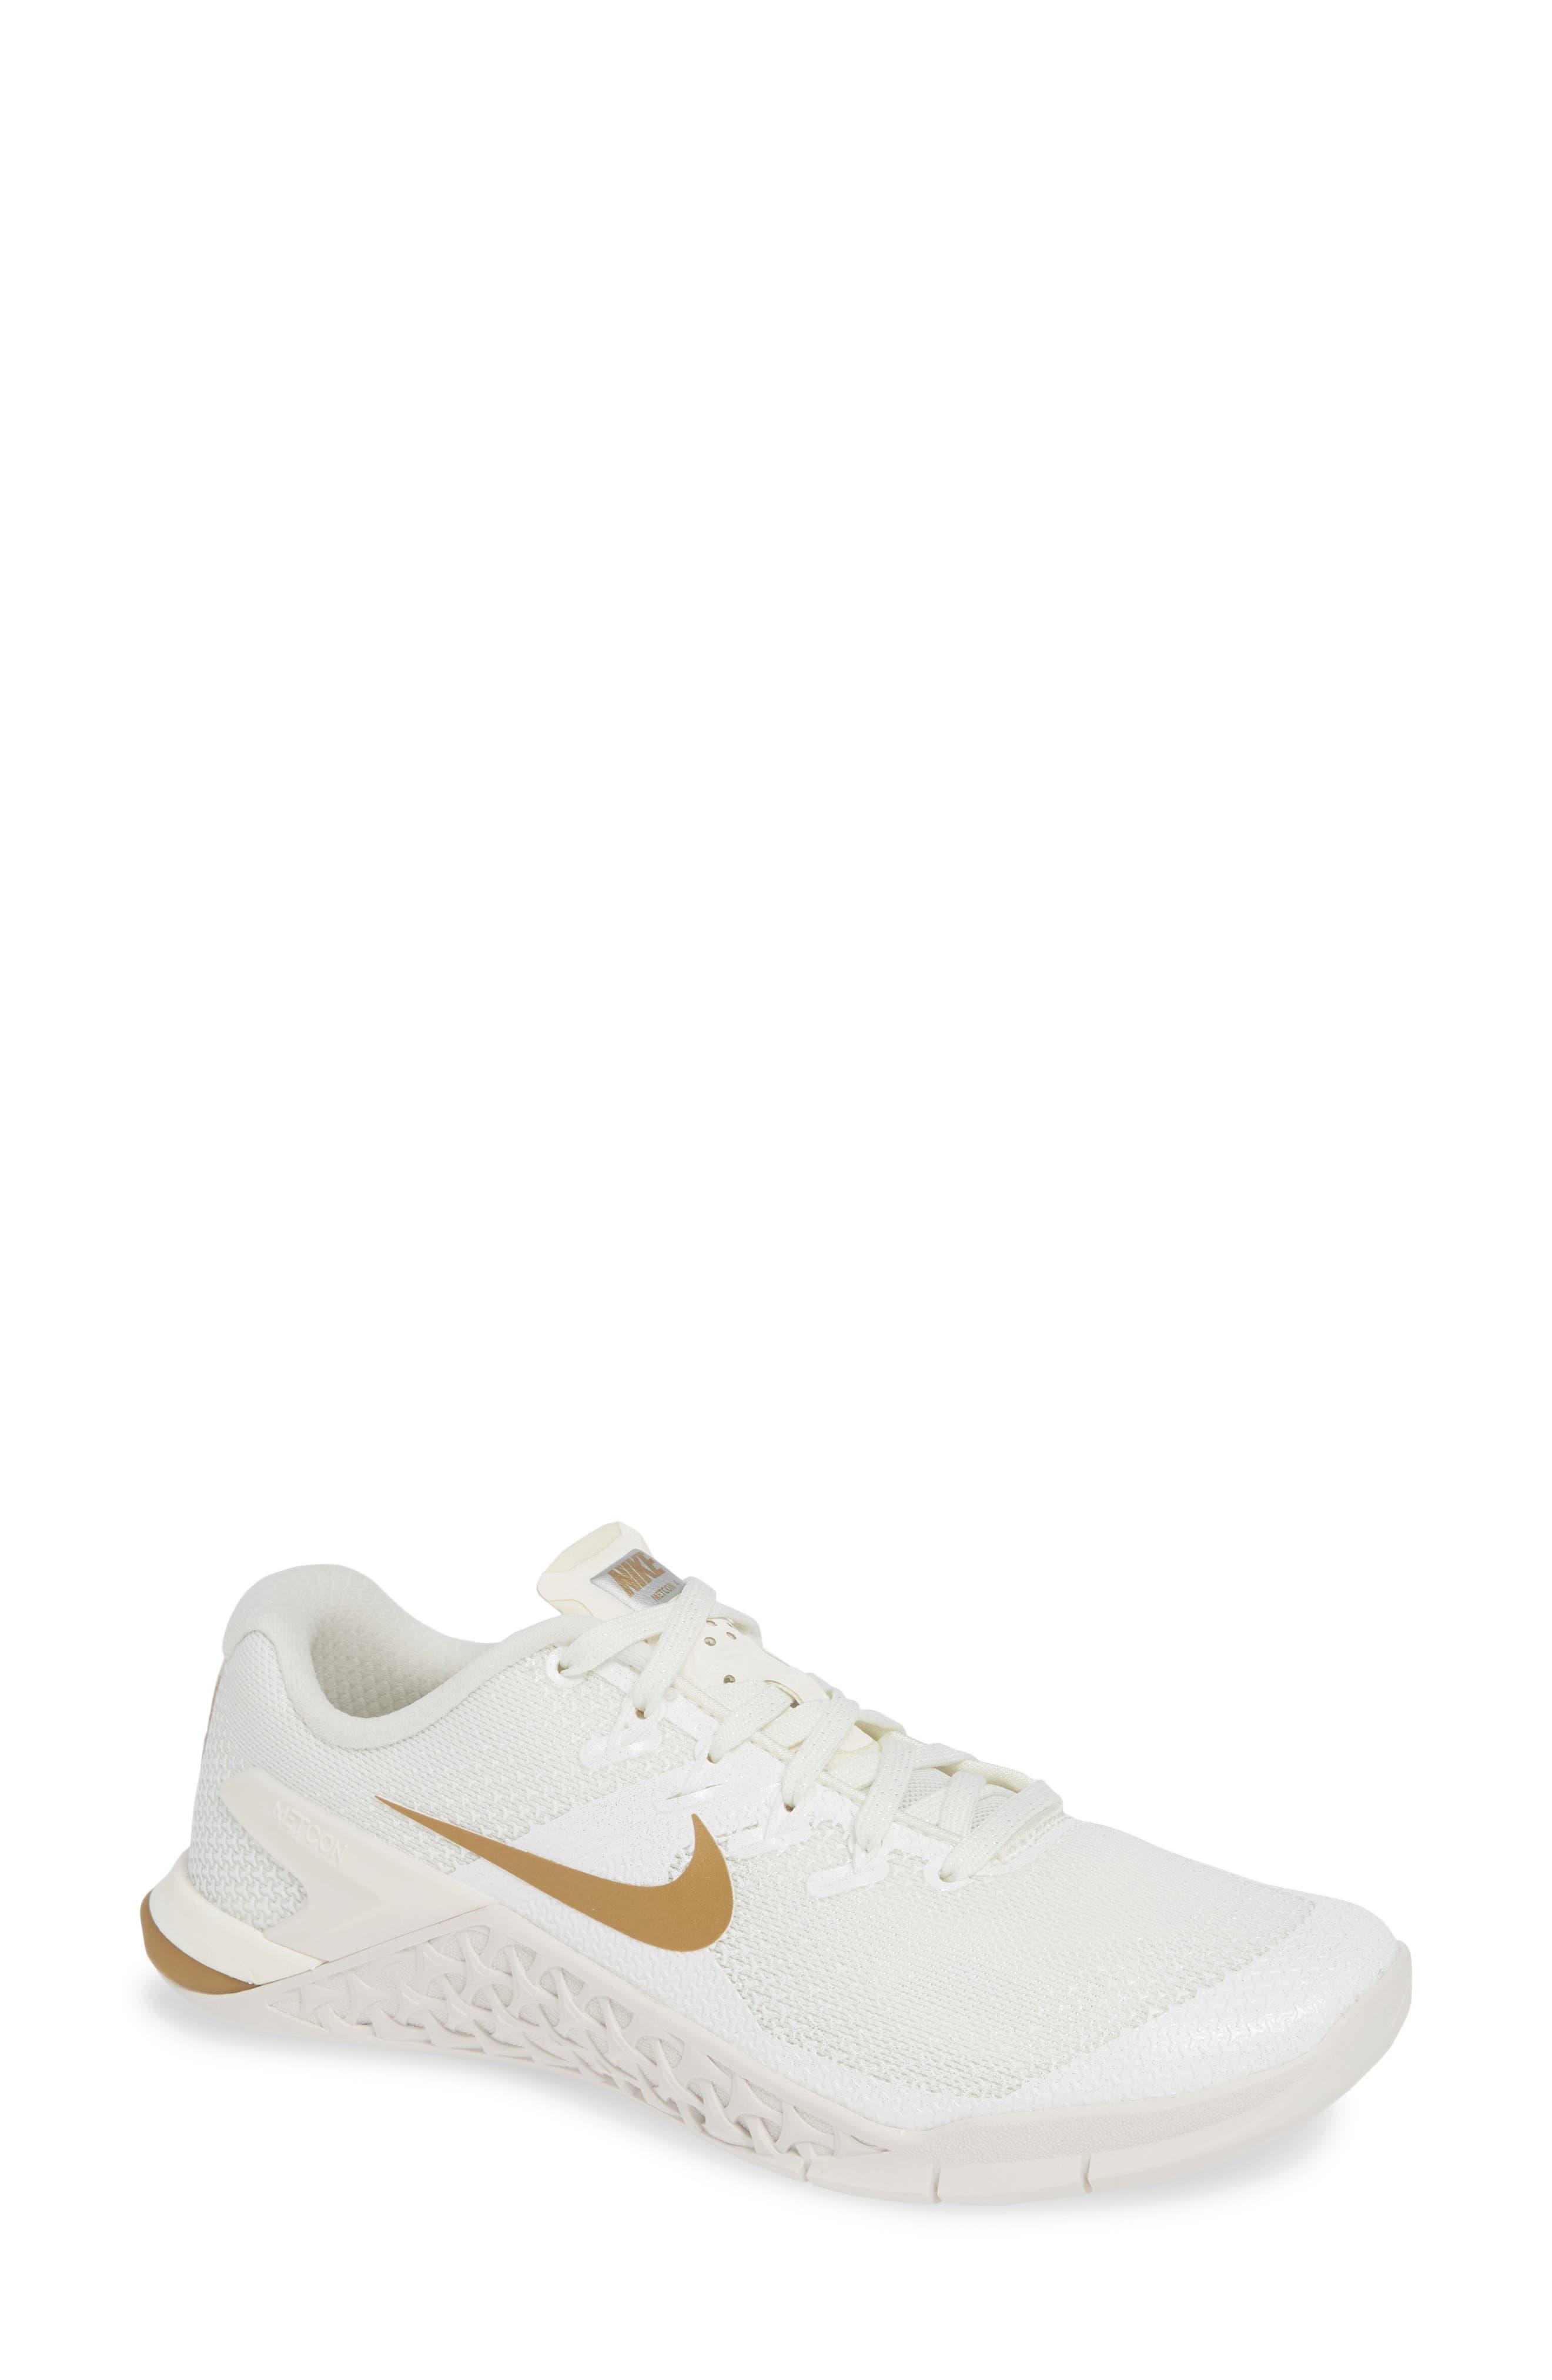 Nike | Metcon 4 Training Shoe